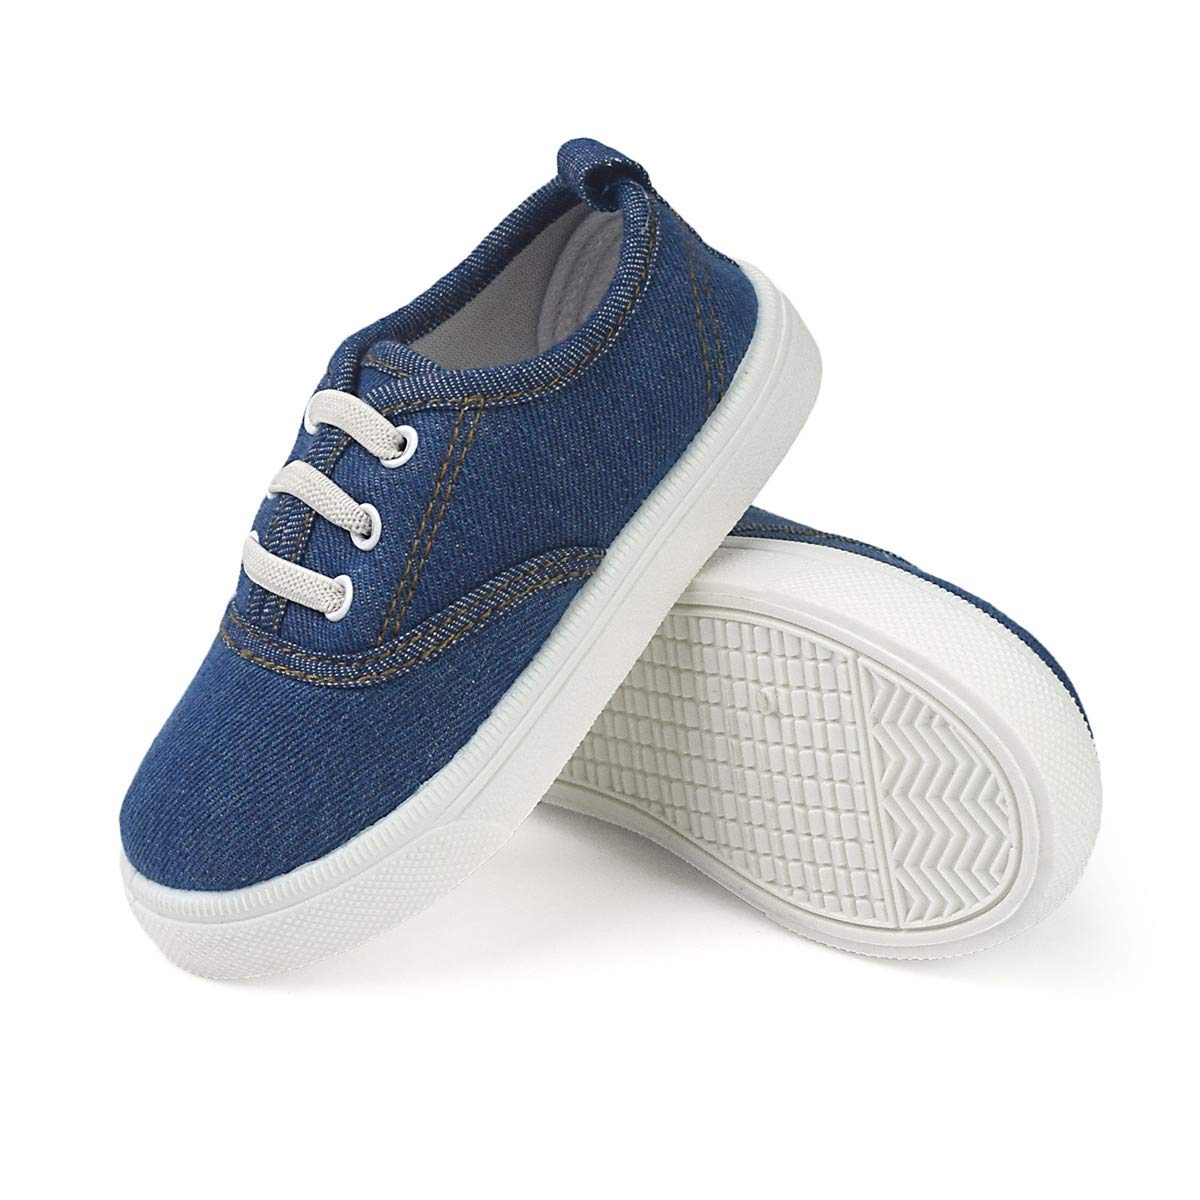 Toddler Canvas Sneaker Slip-On Soft Sole Little Kids Boys Girls Outdoor Tennis Walking Shoes